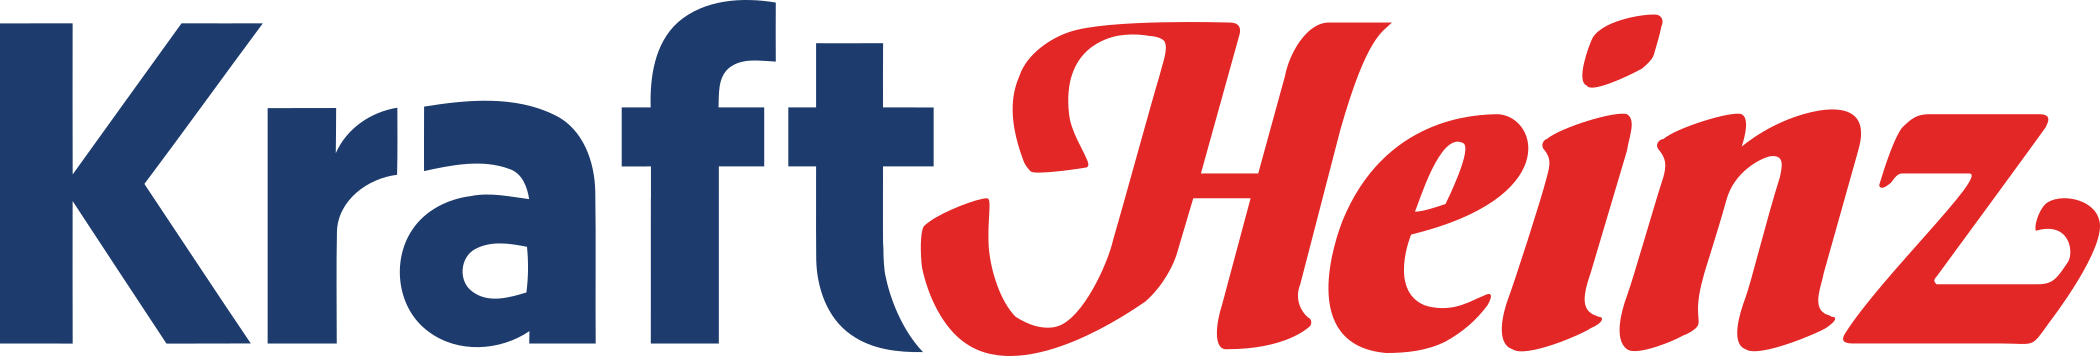 kraft-heinz-logo-1